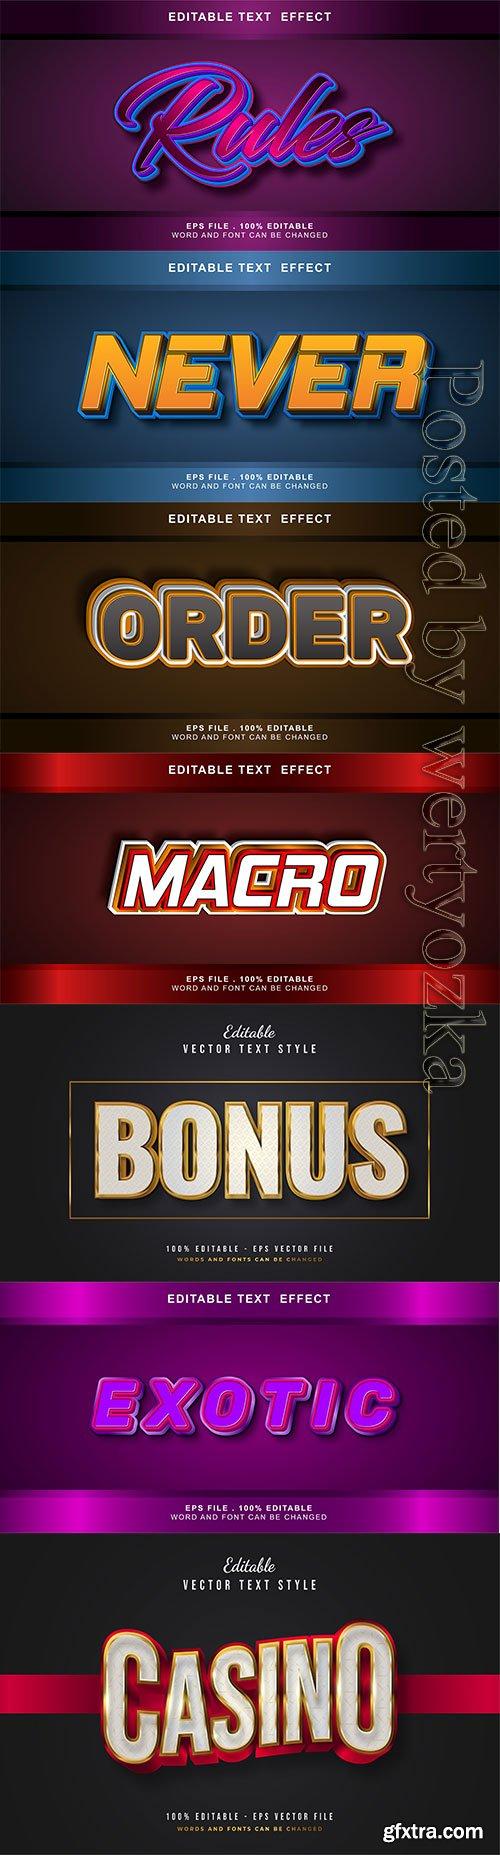 3d editable text style effect vector vol 261